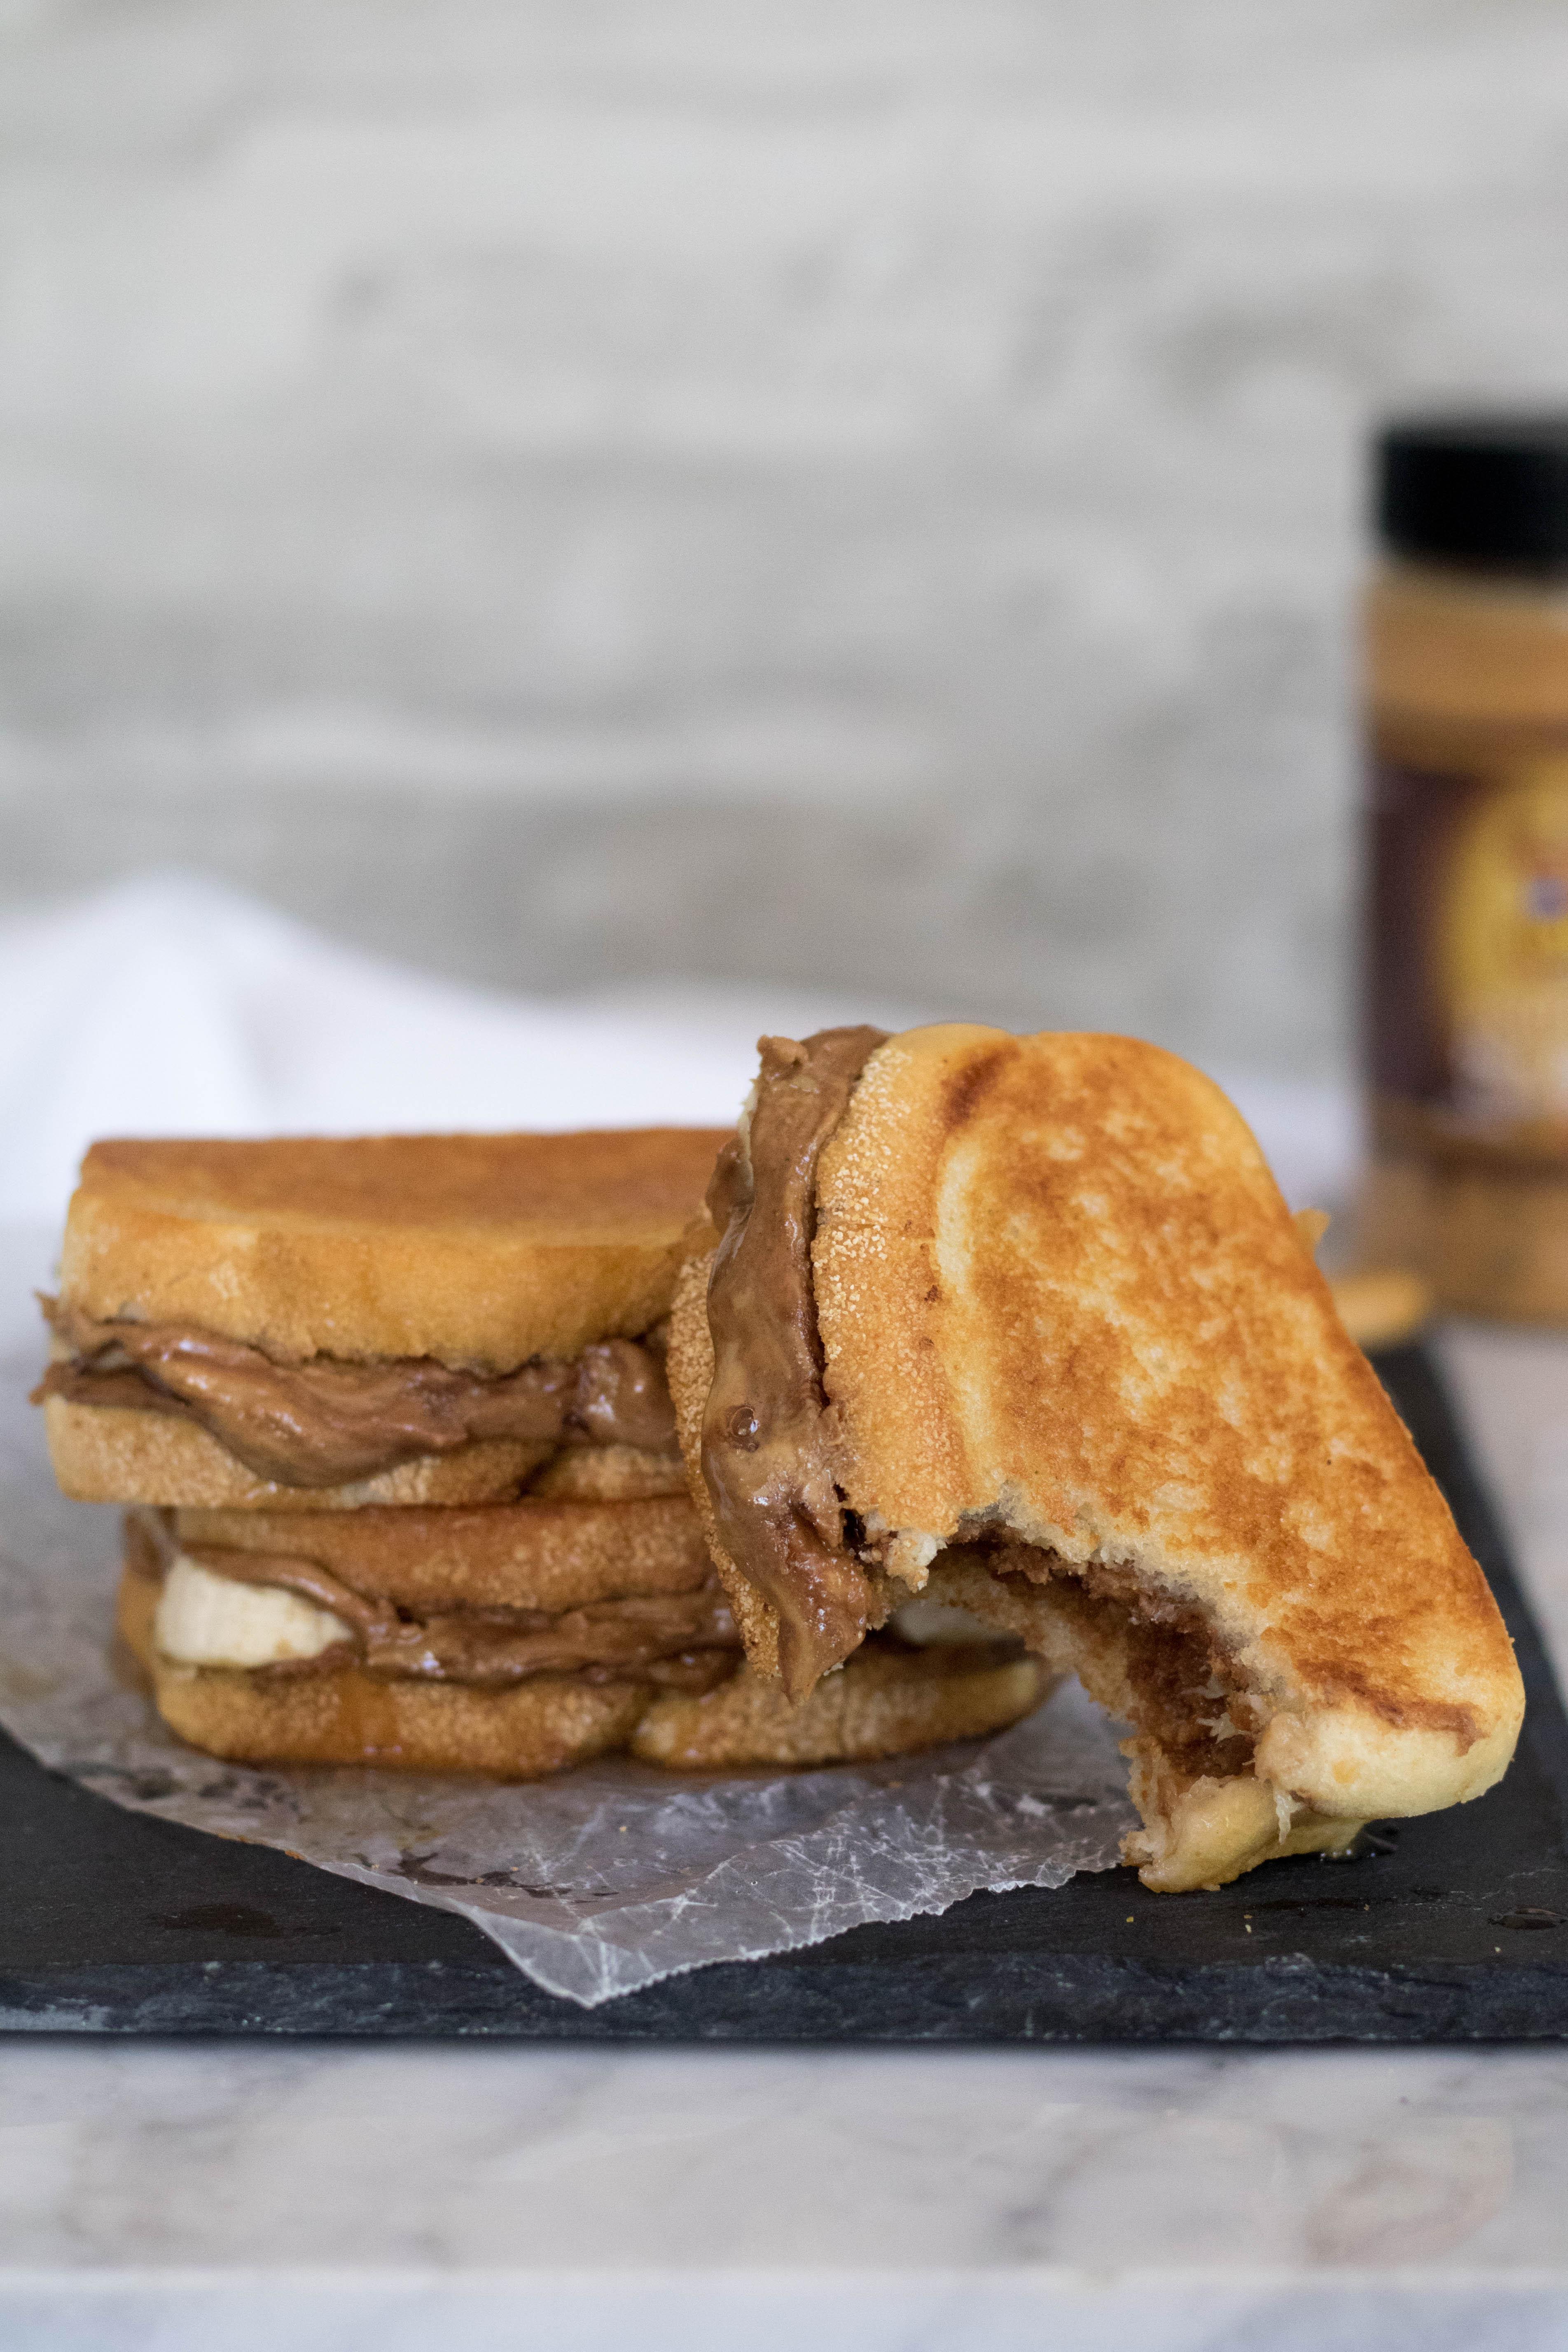 The best Grilled Peanut butter anad banana sandwich bitten